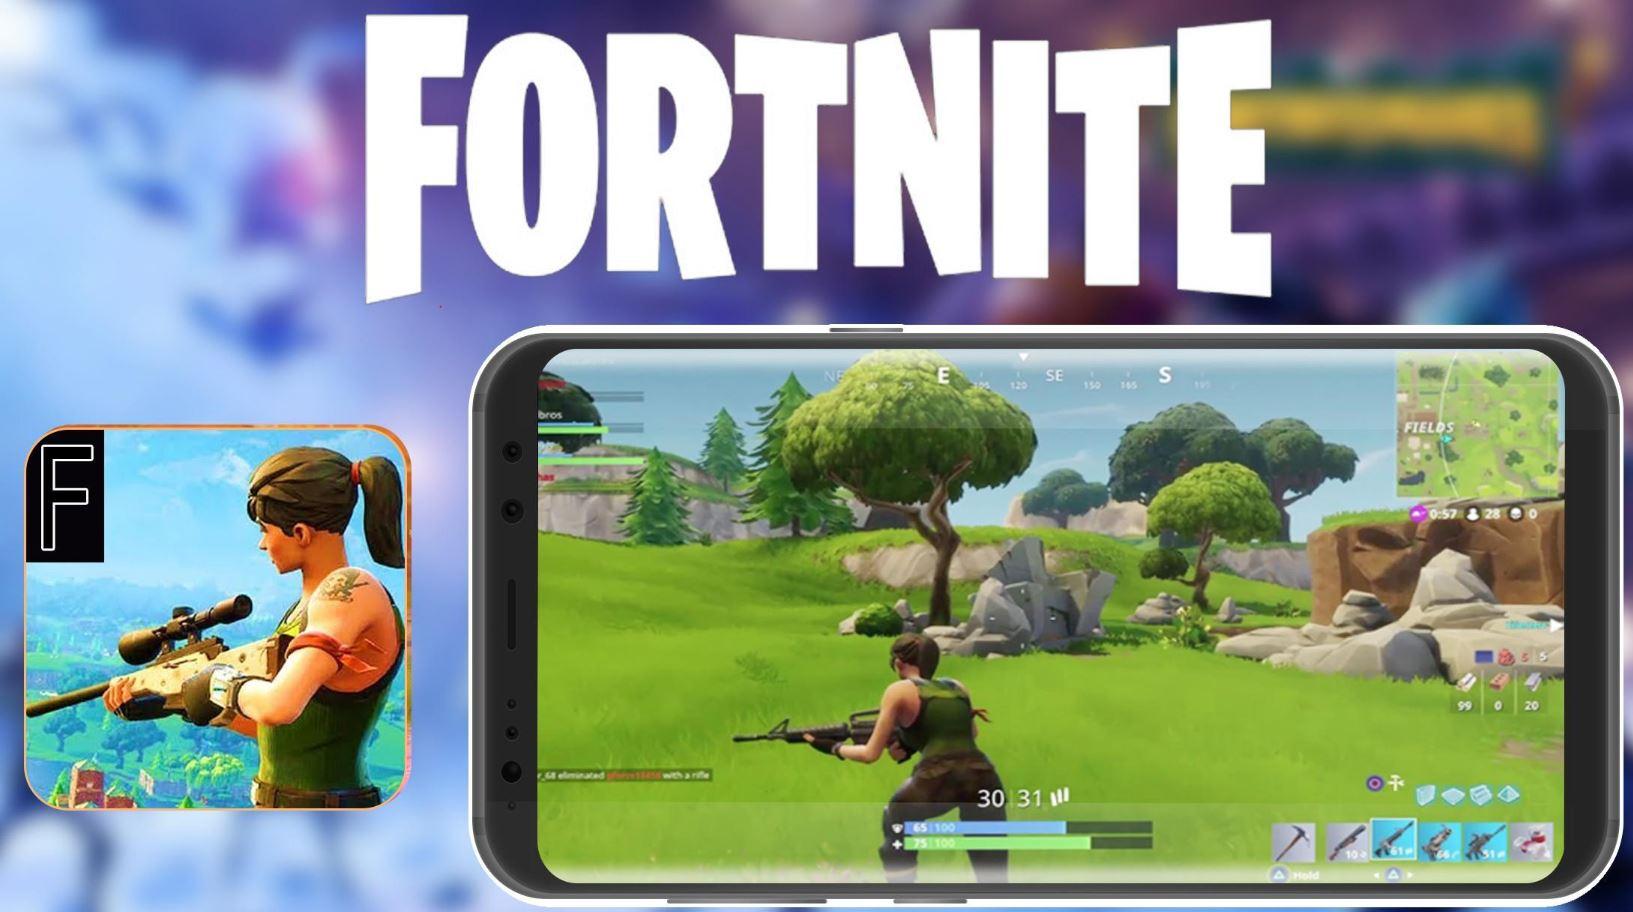 fortnite iphone-spel